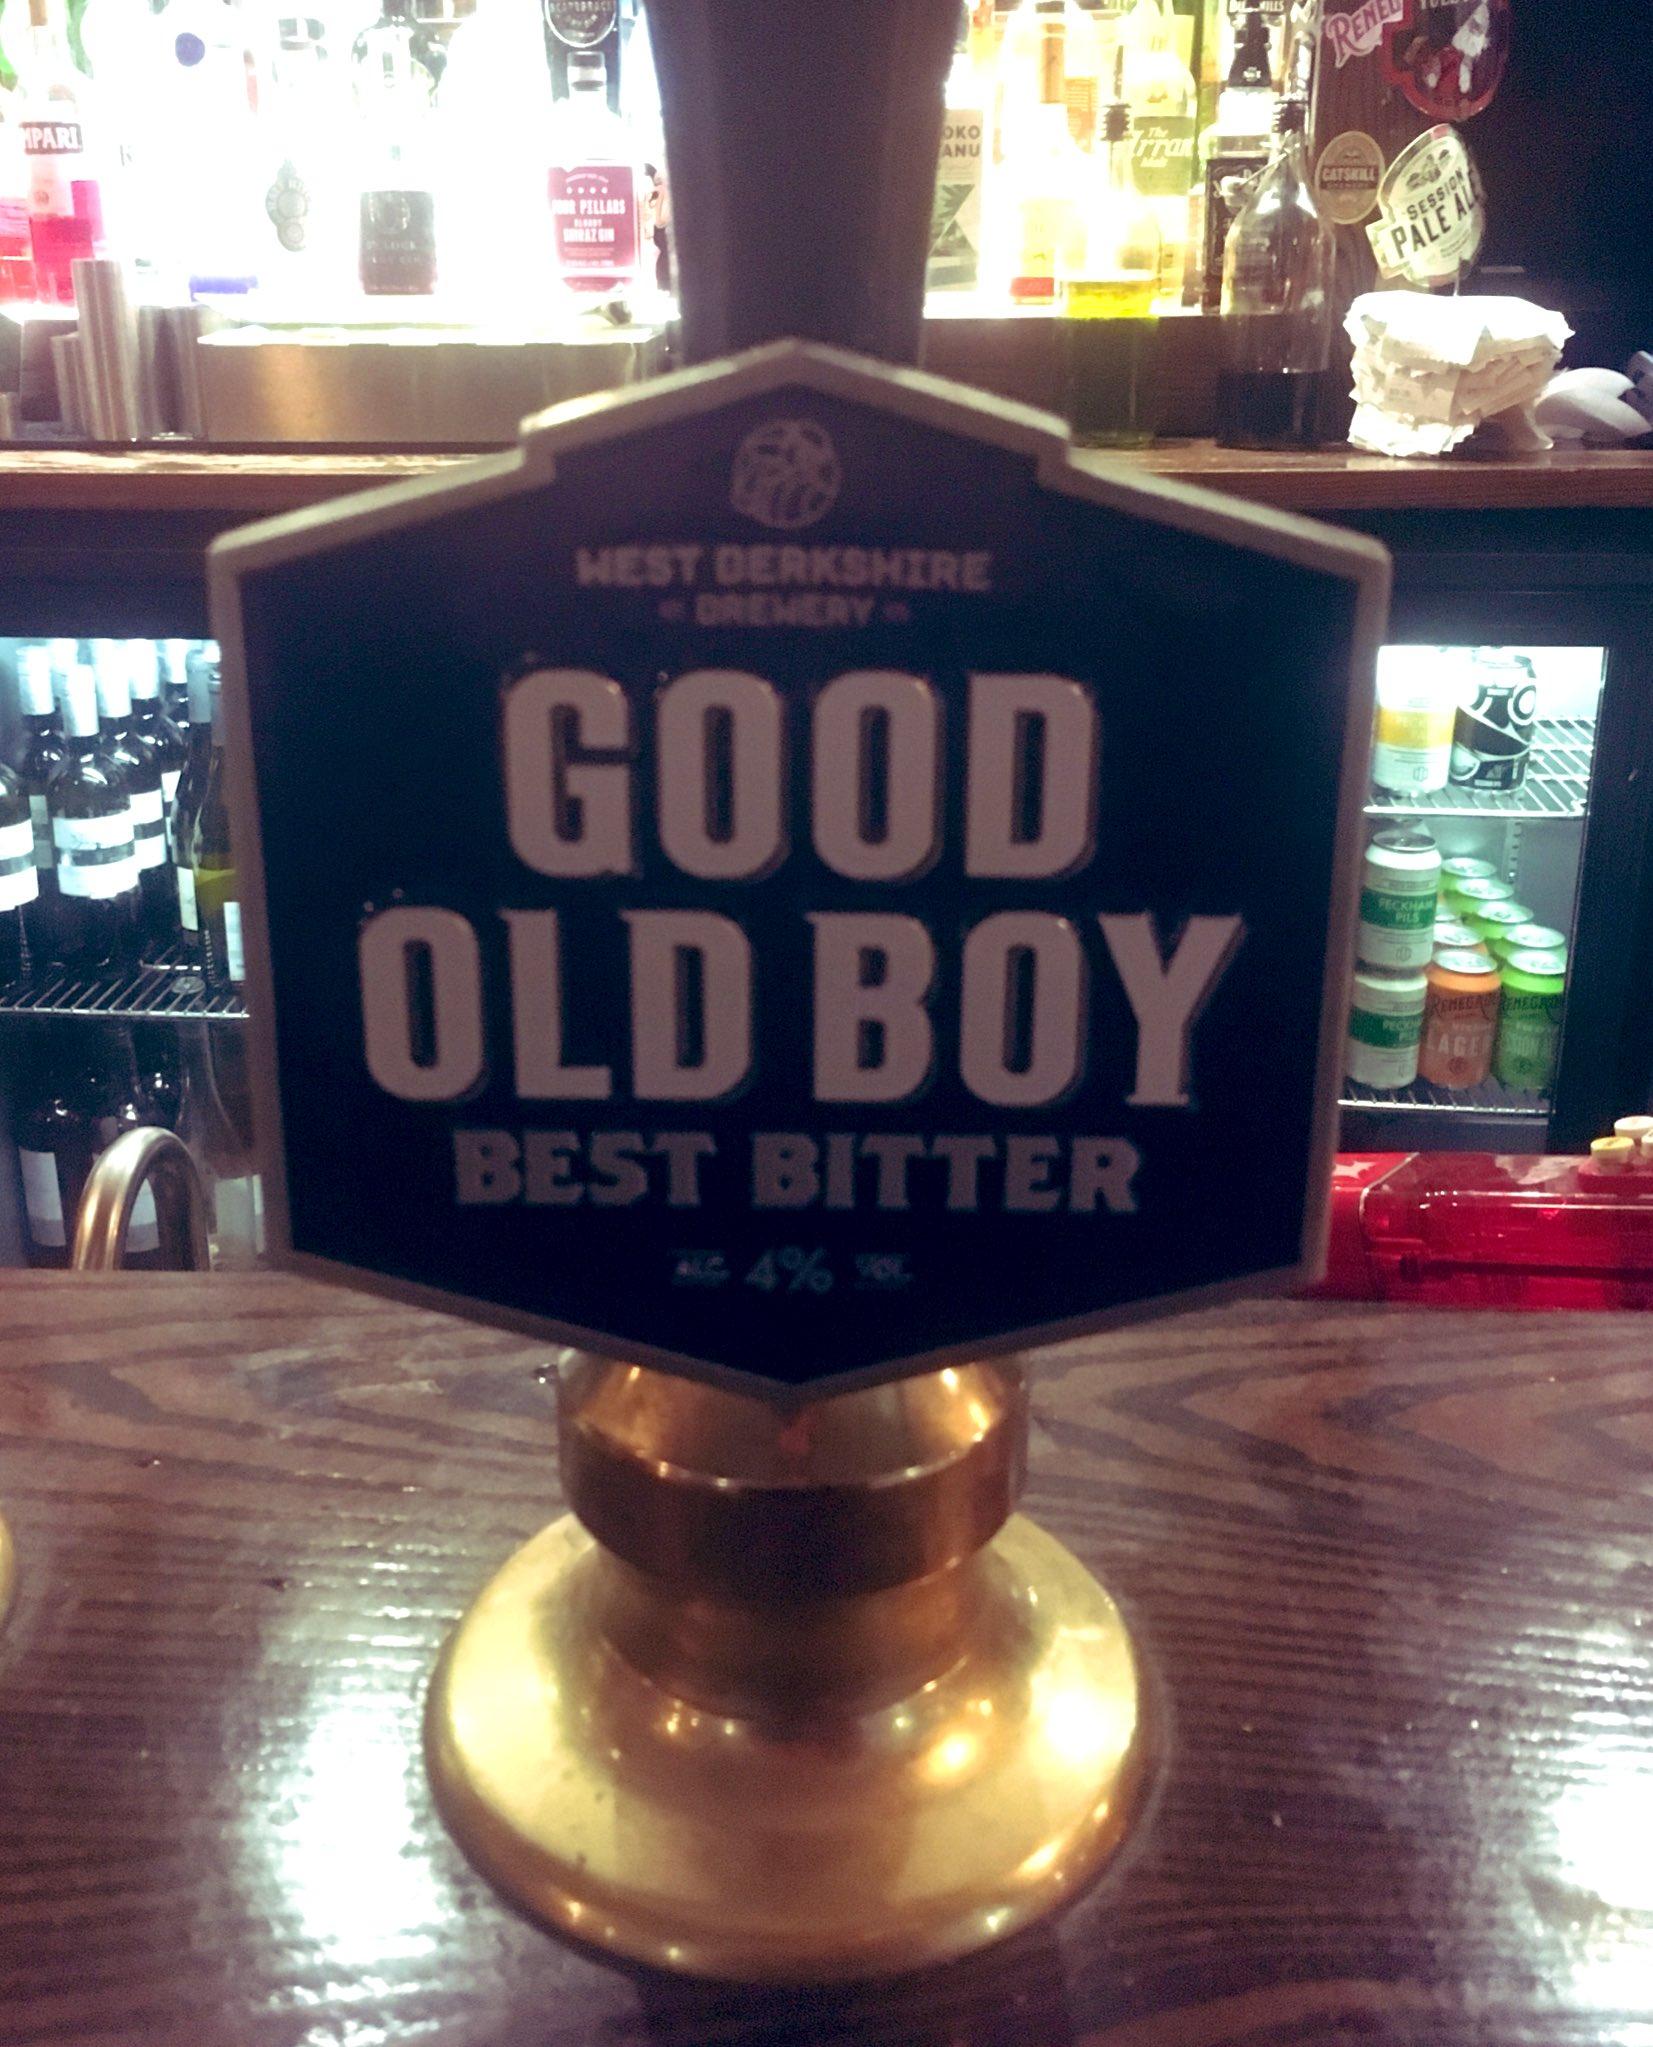 282: Good Old Boy